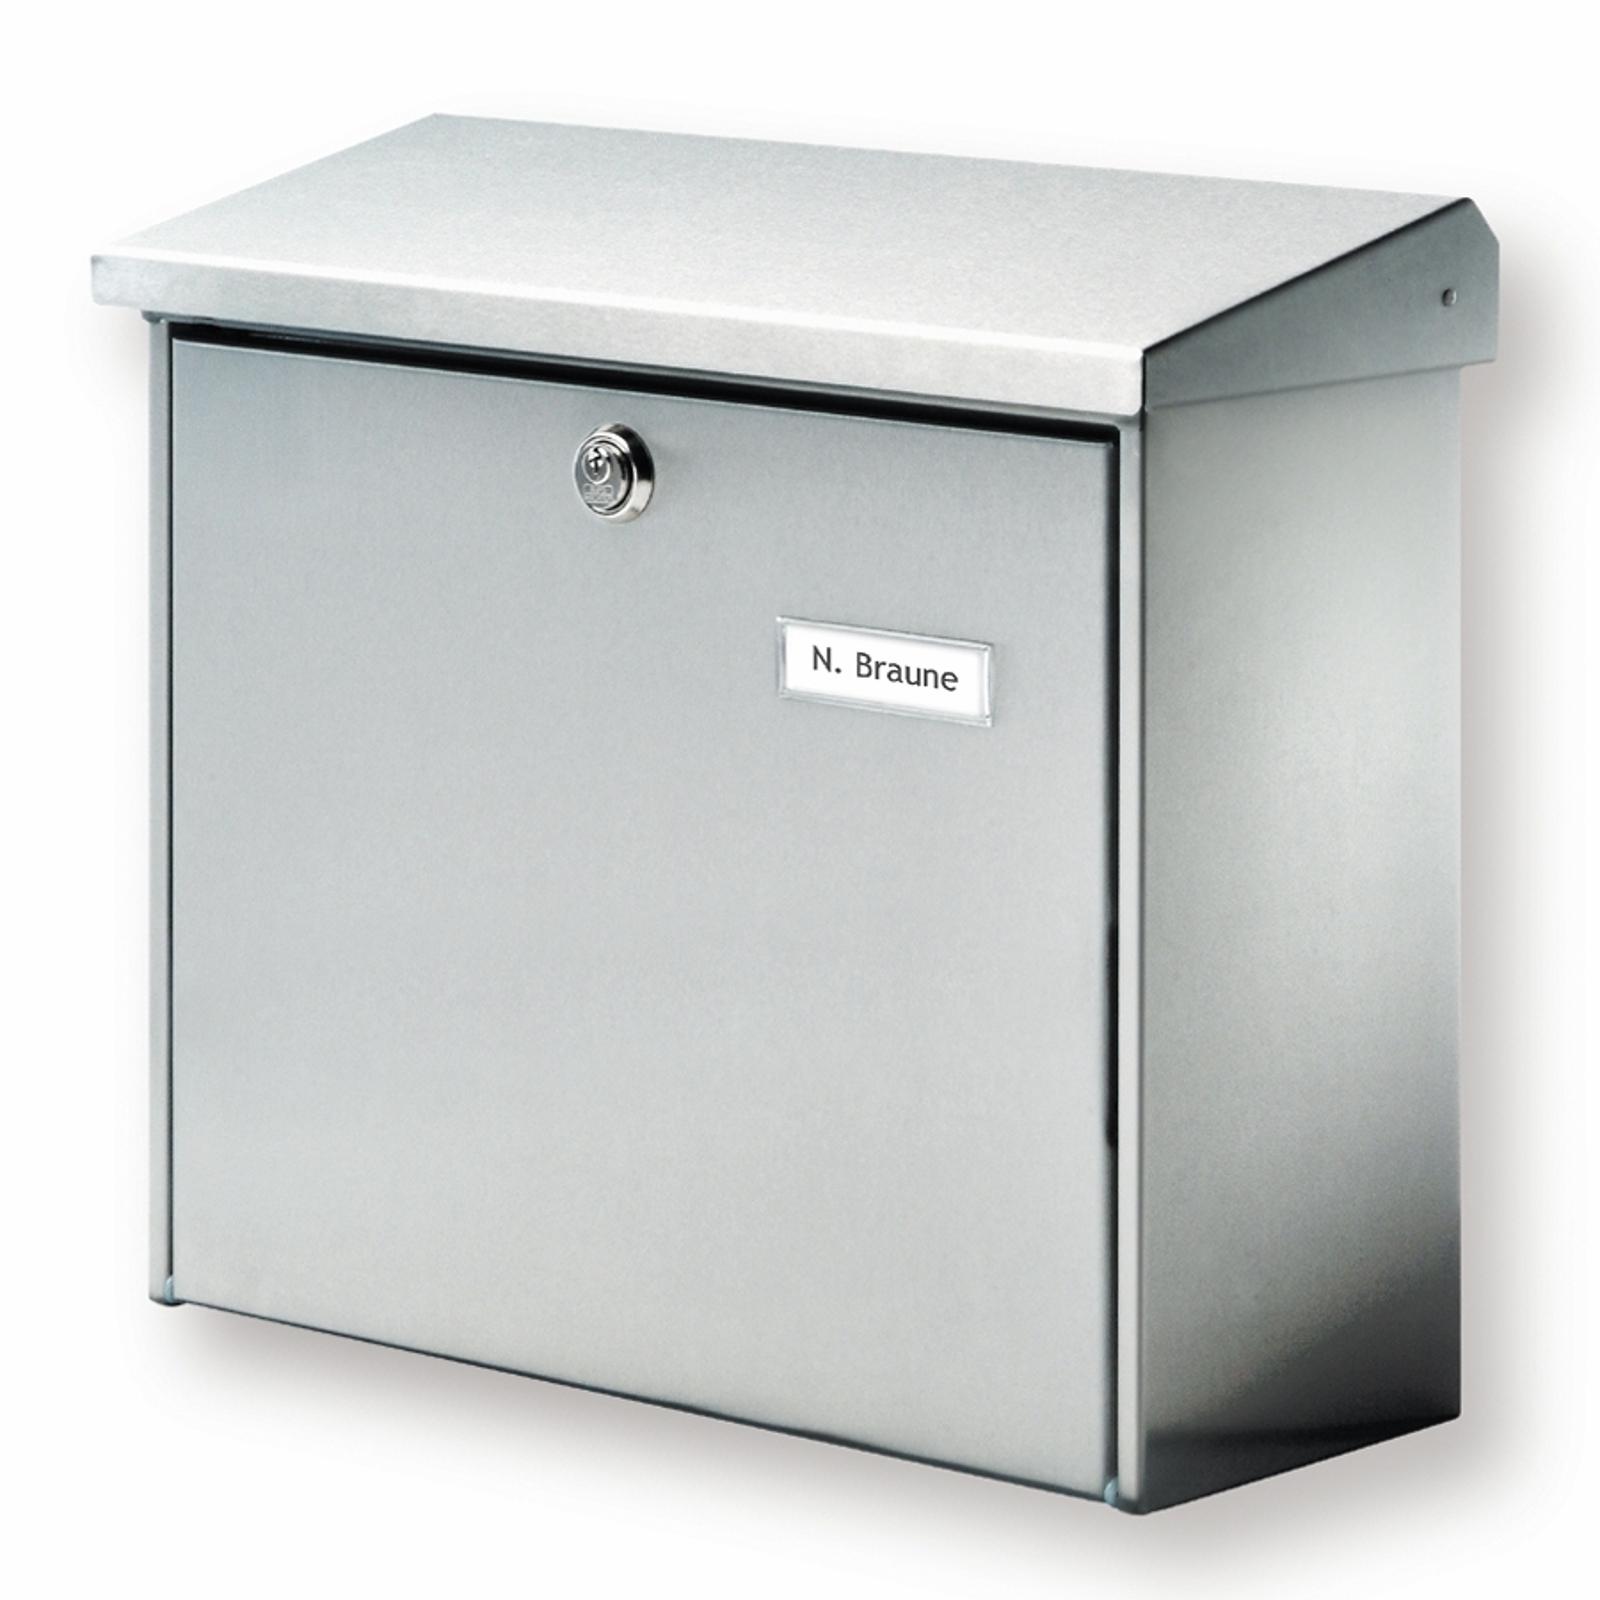 Classica cassetta postale Comfort di acciaio